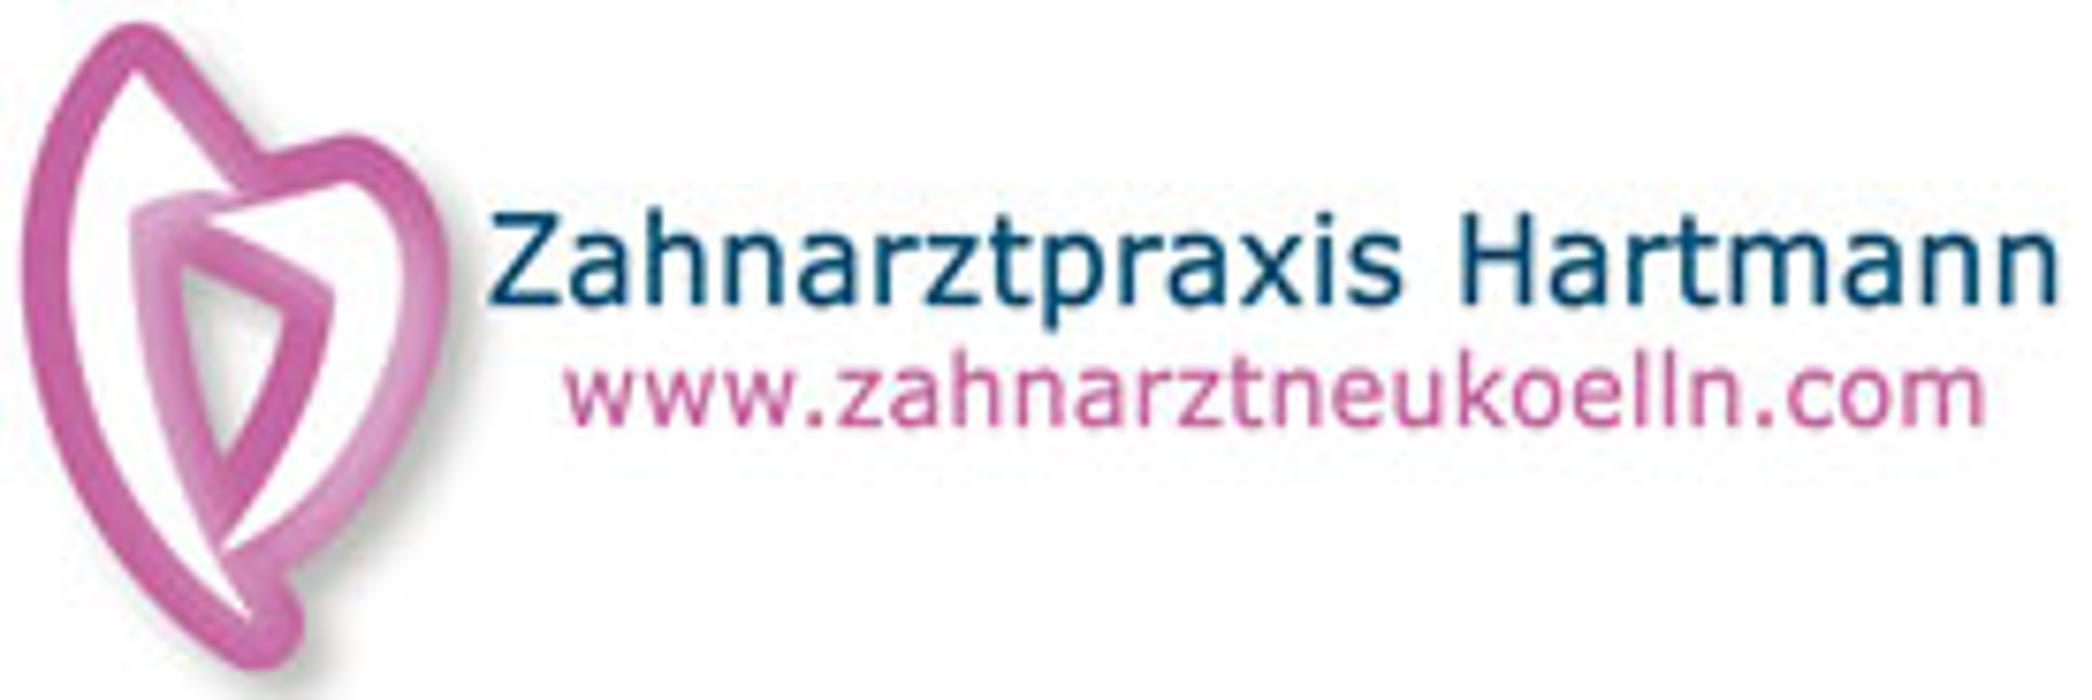 Bild zu Zahnarztpraxis Hartmann in Berlin